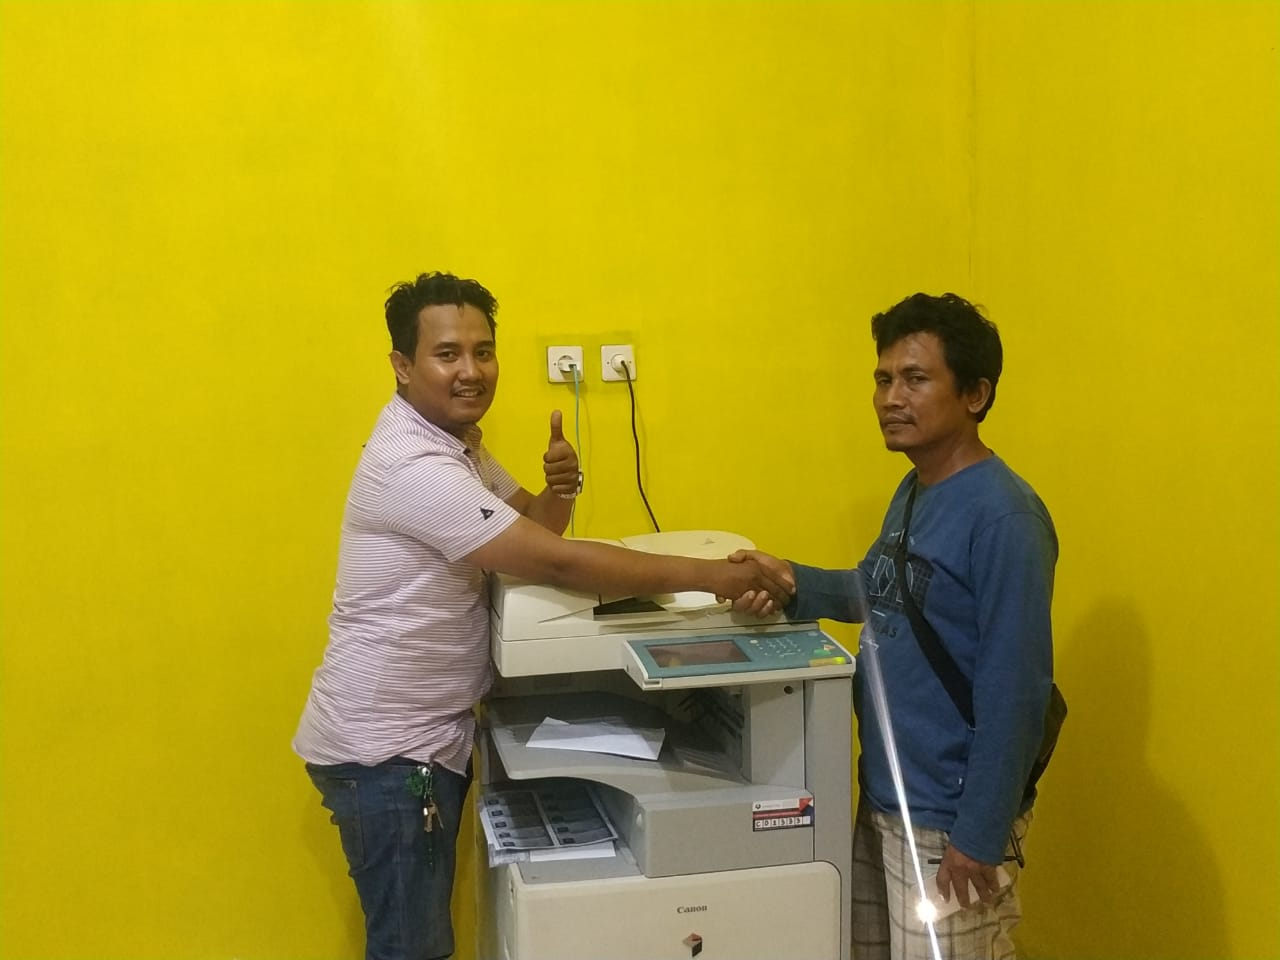 Pengiriman Penjualan Mesin Fotocopy Mesin Fotocopy Canon Ir 3045 | 3035 Milik Bp. Sutrisno